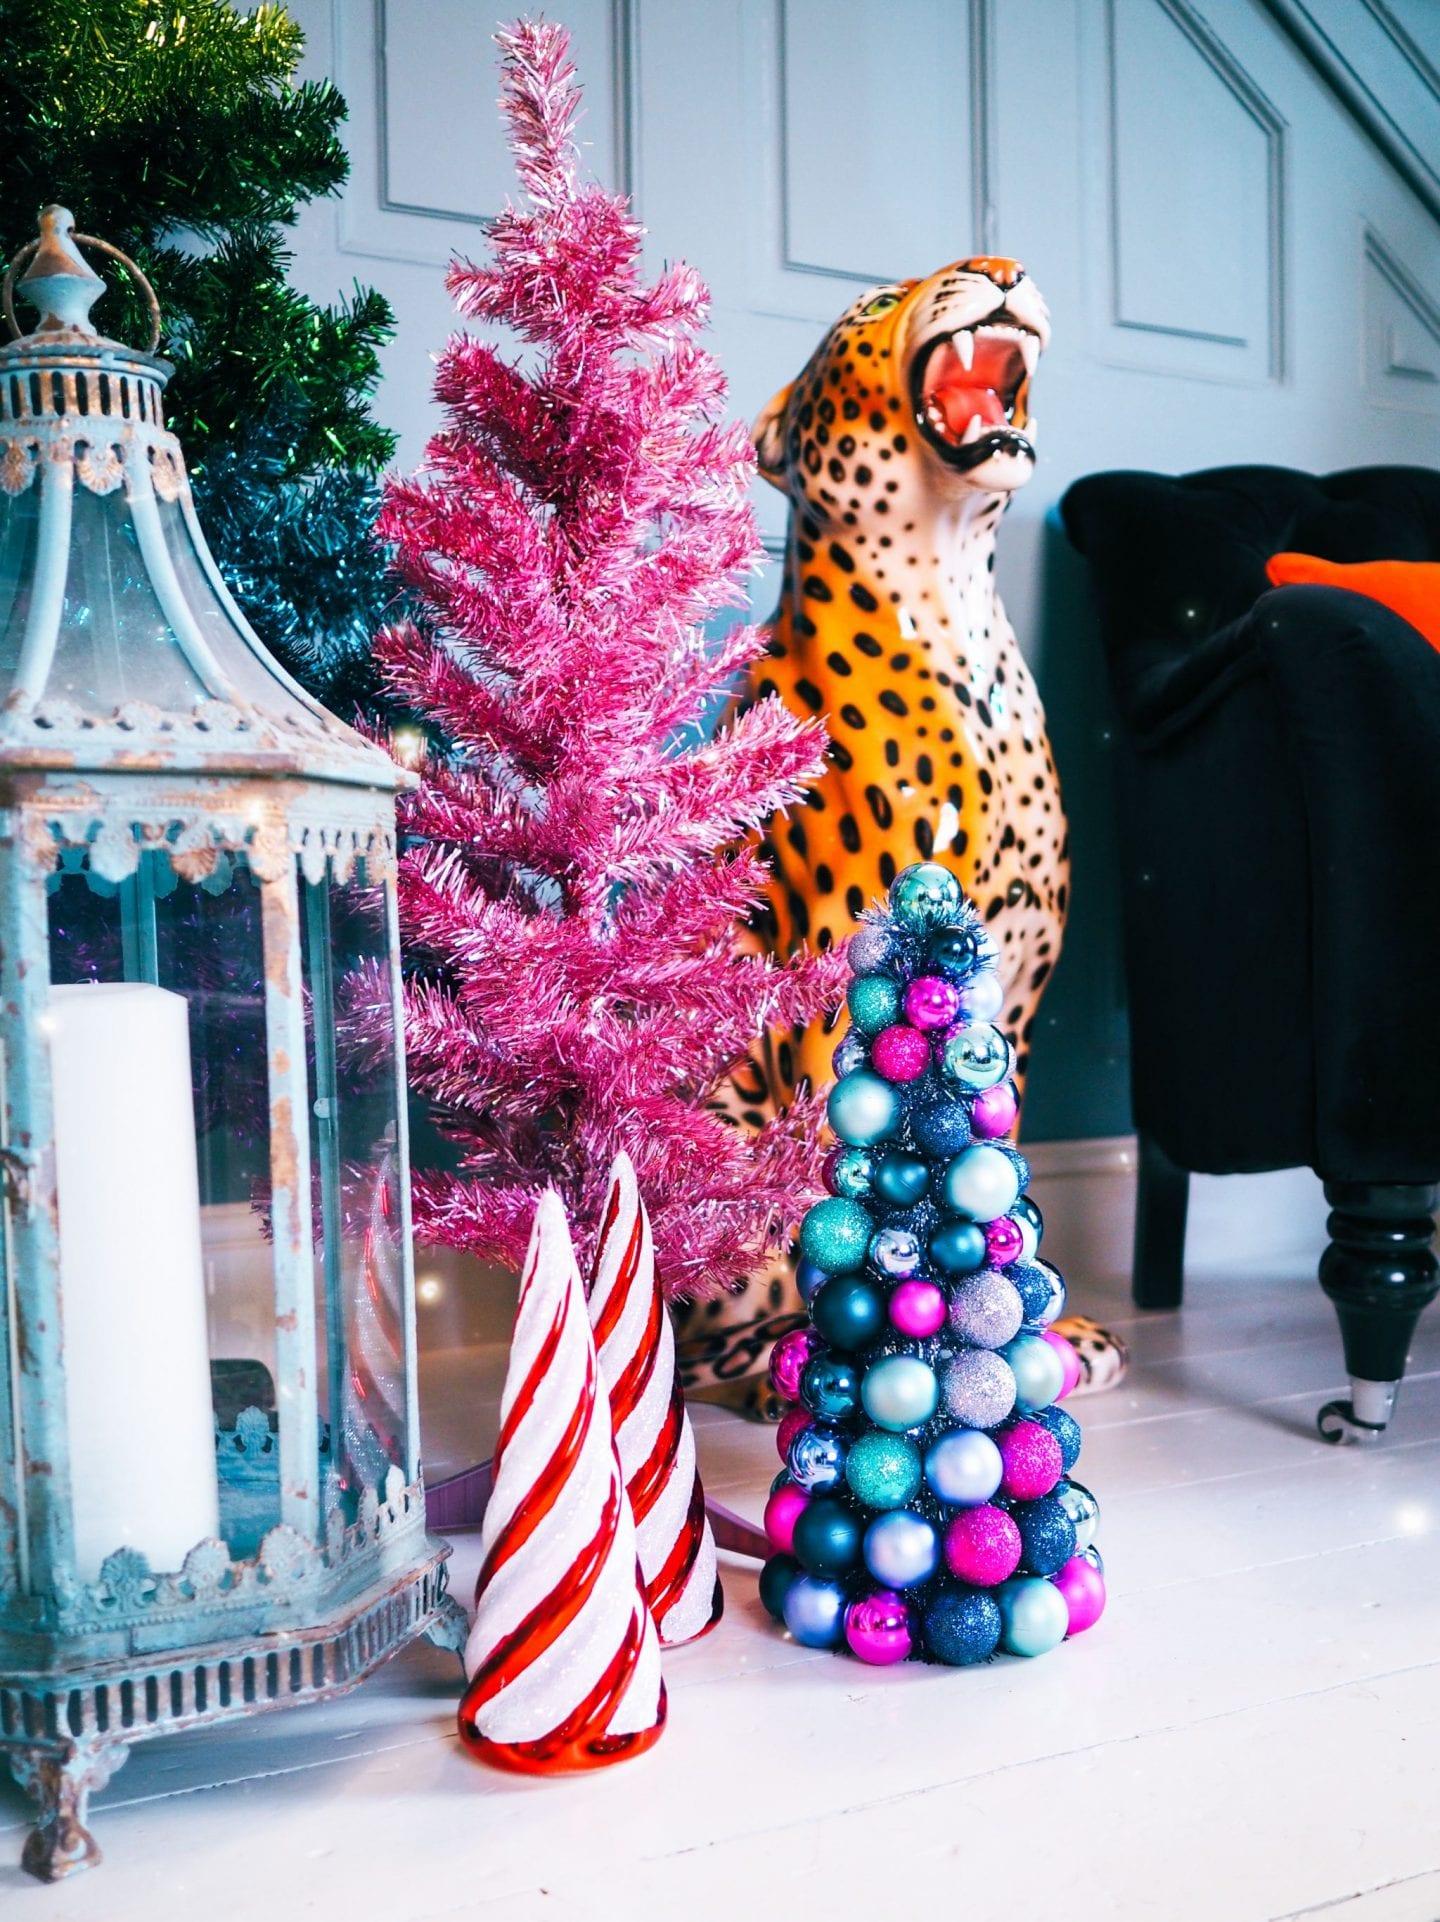 matalan christmas 2019 red and white christmas tree cones